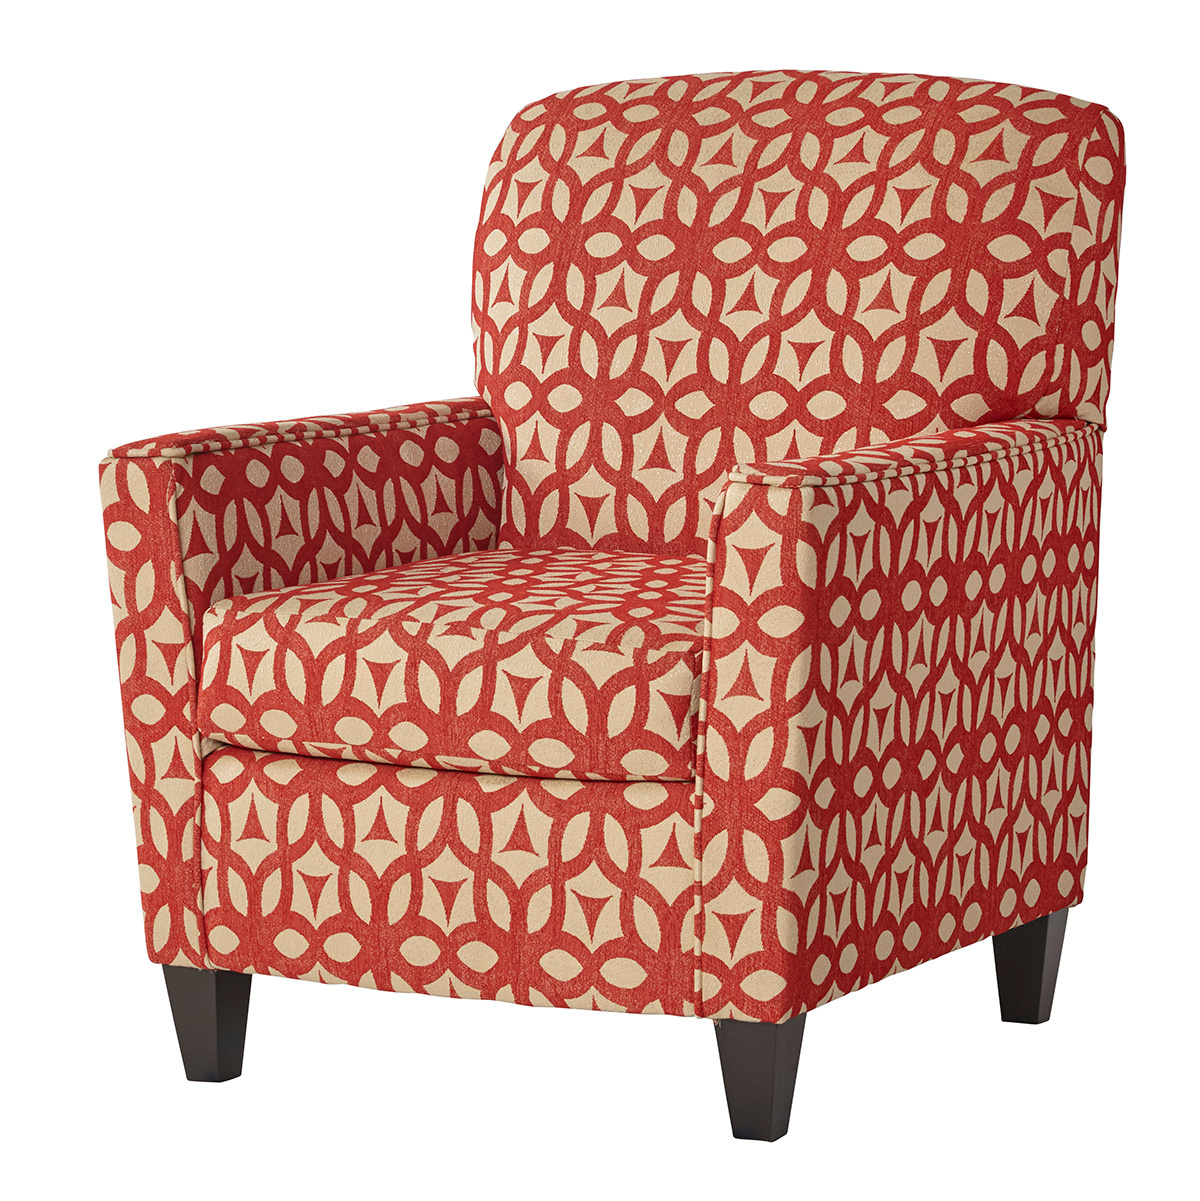 35FORU Serta Accent Chair